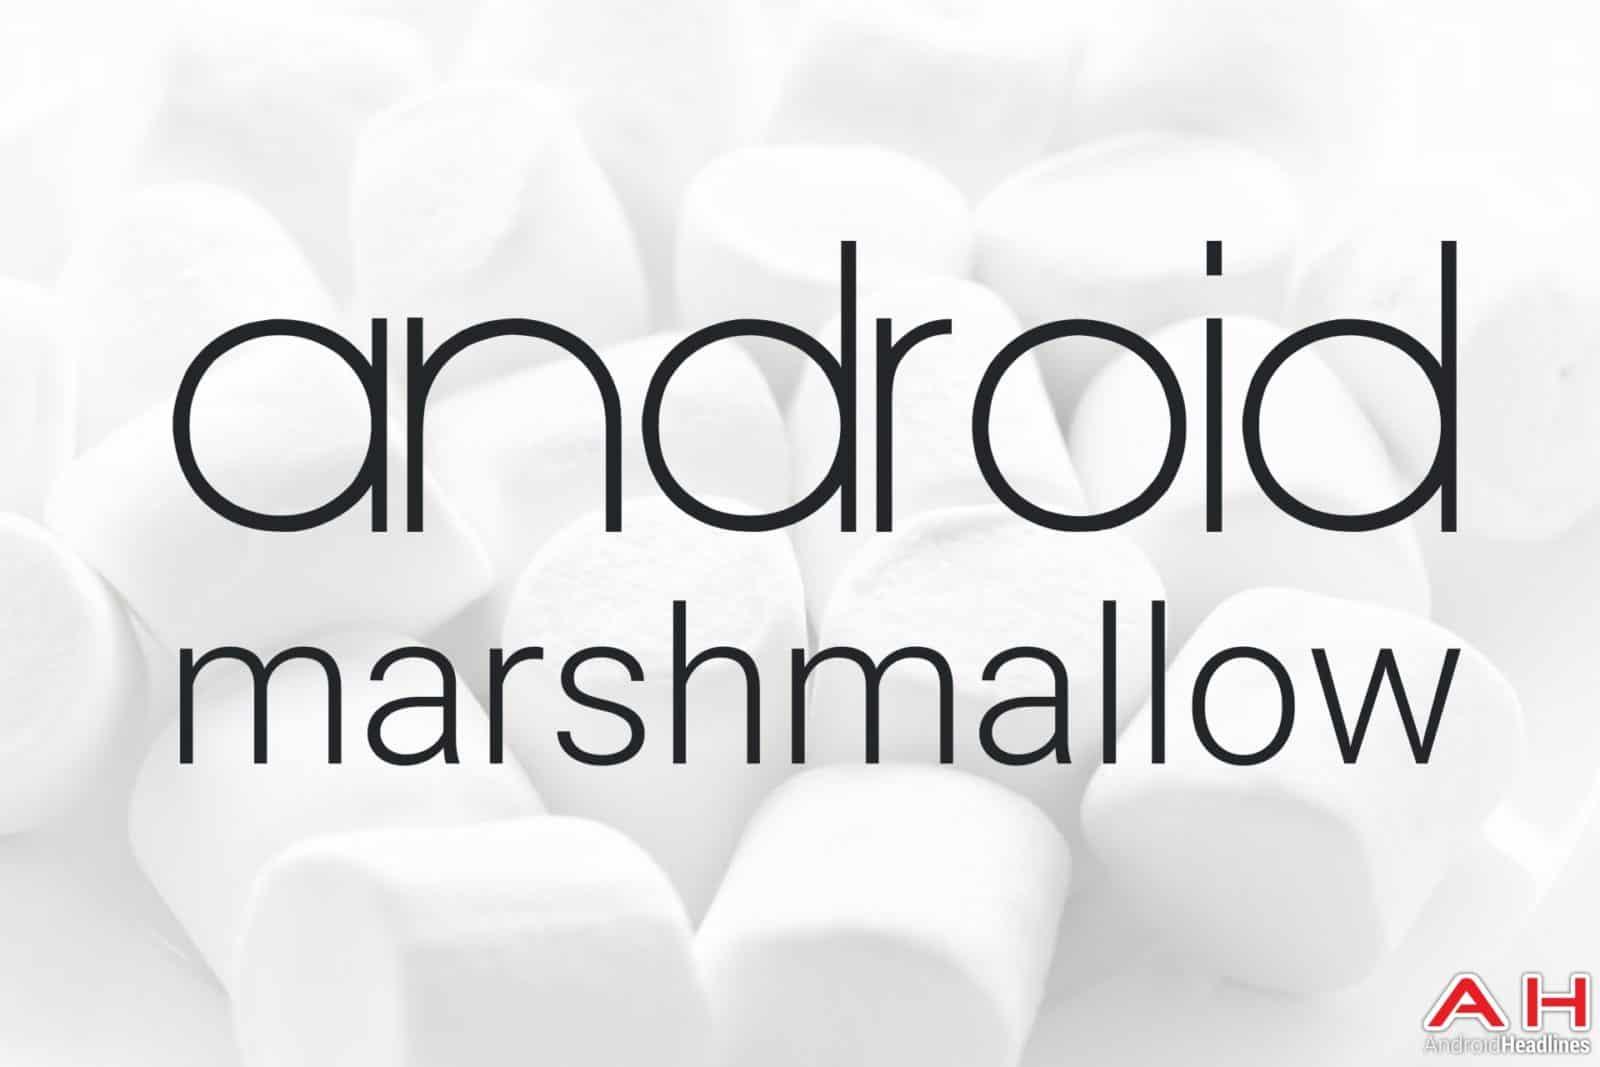 AH Android Marshmallow Logo 1.2